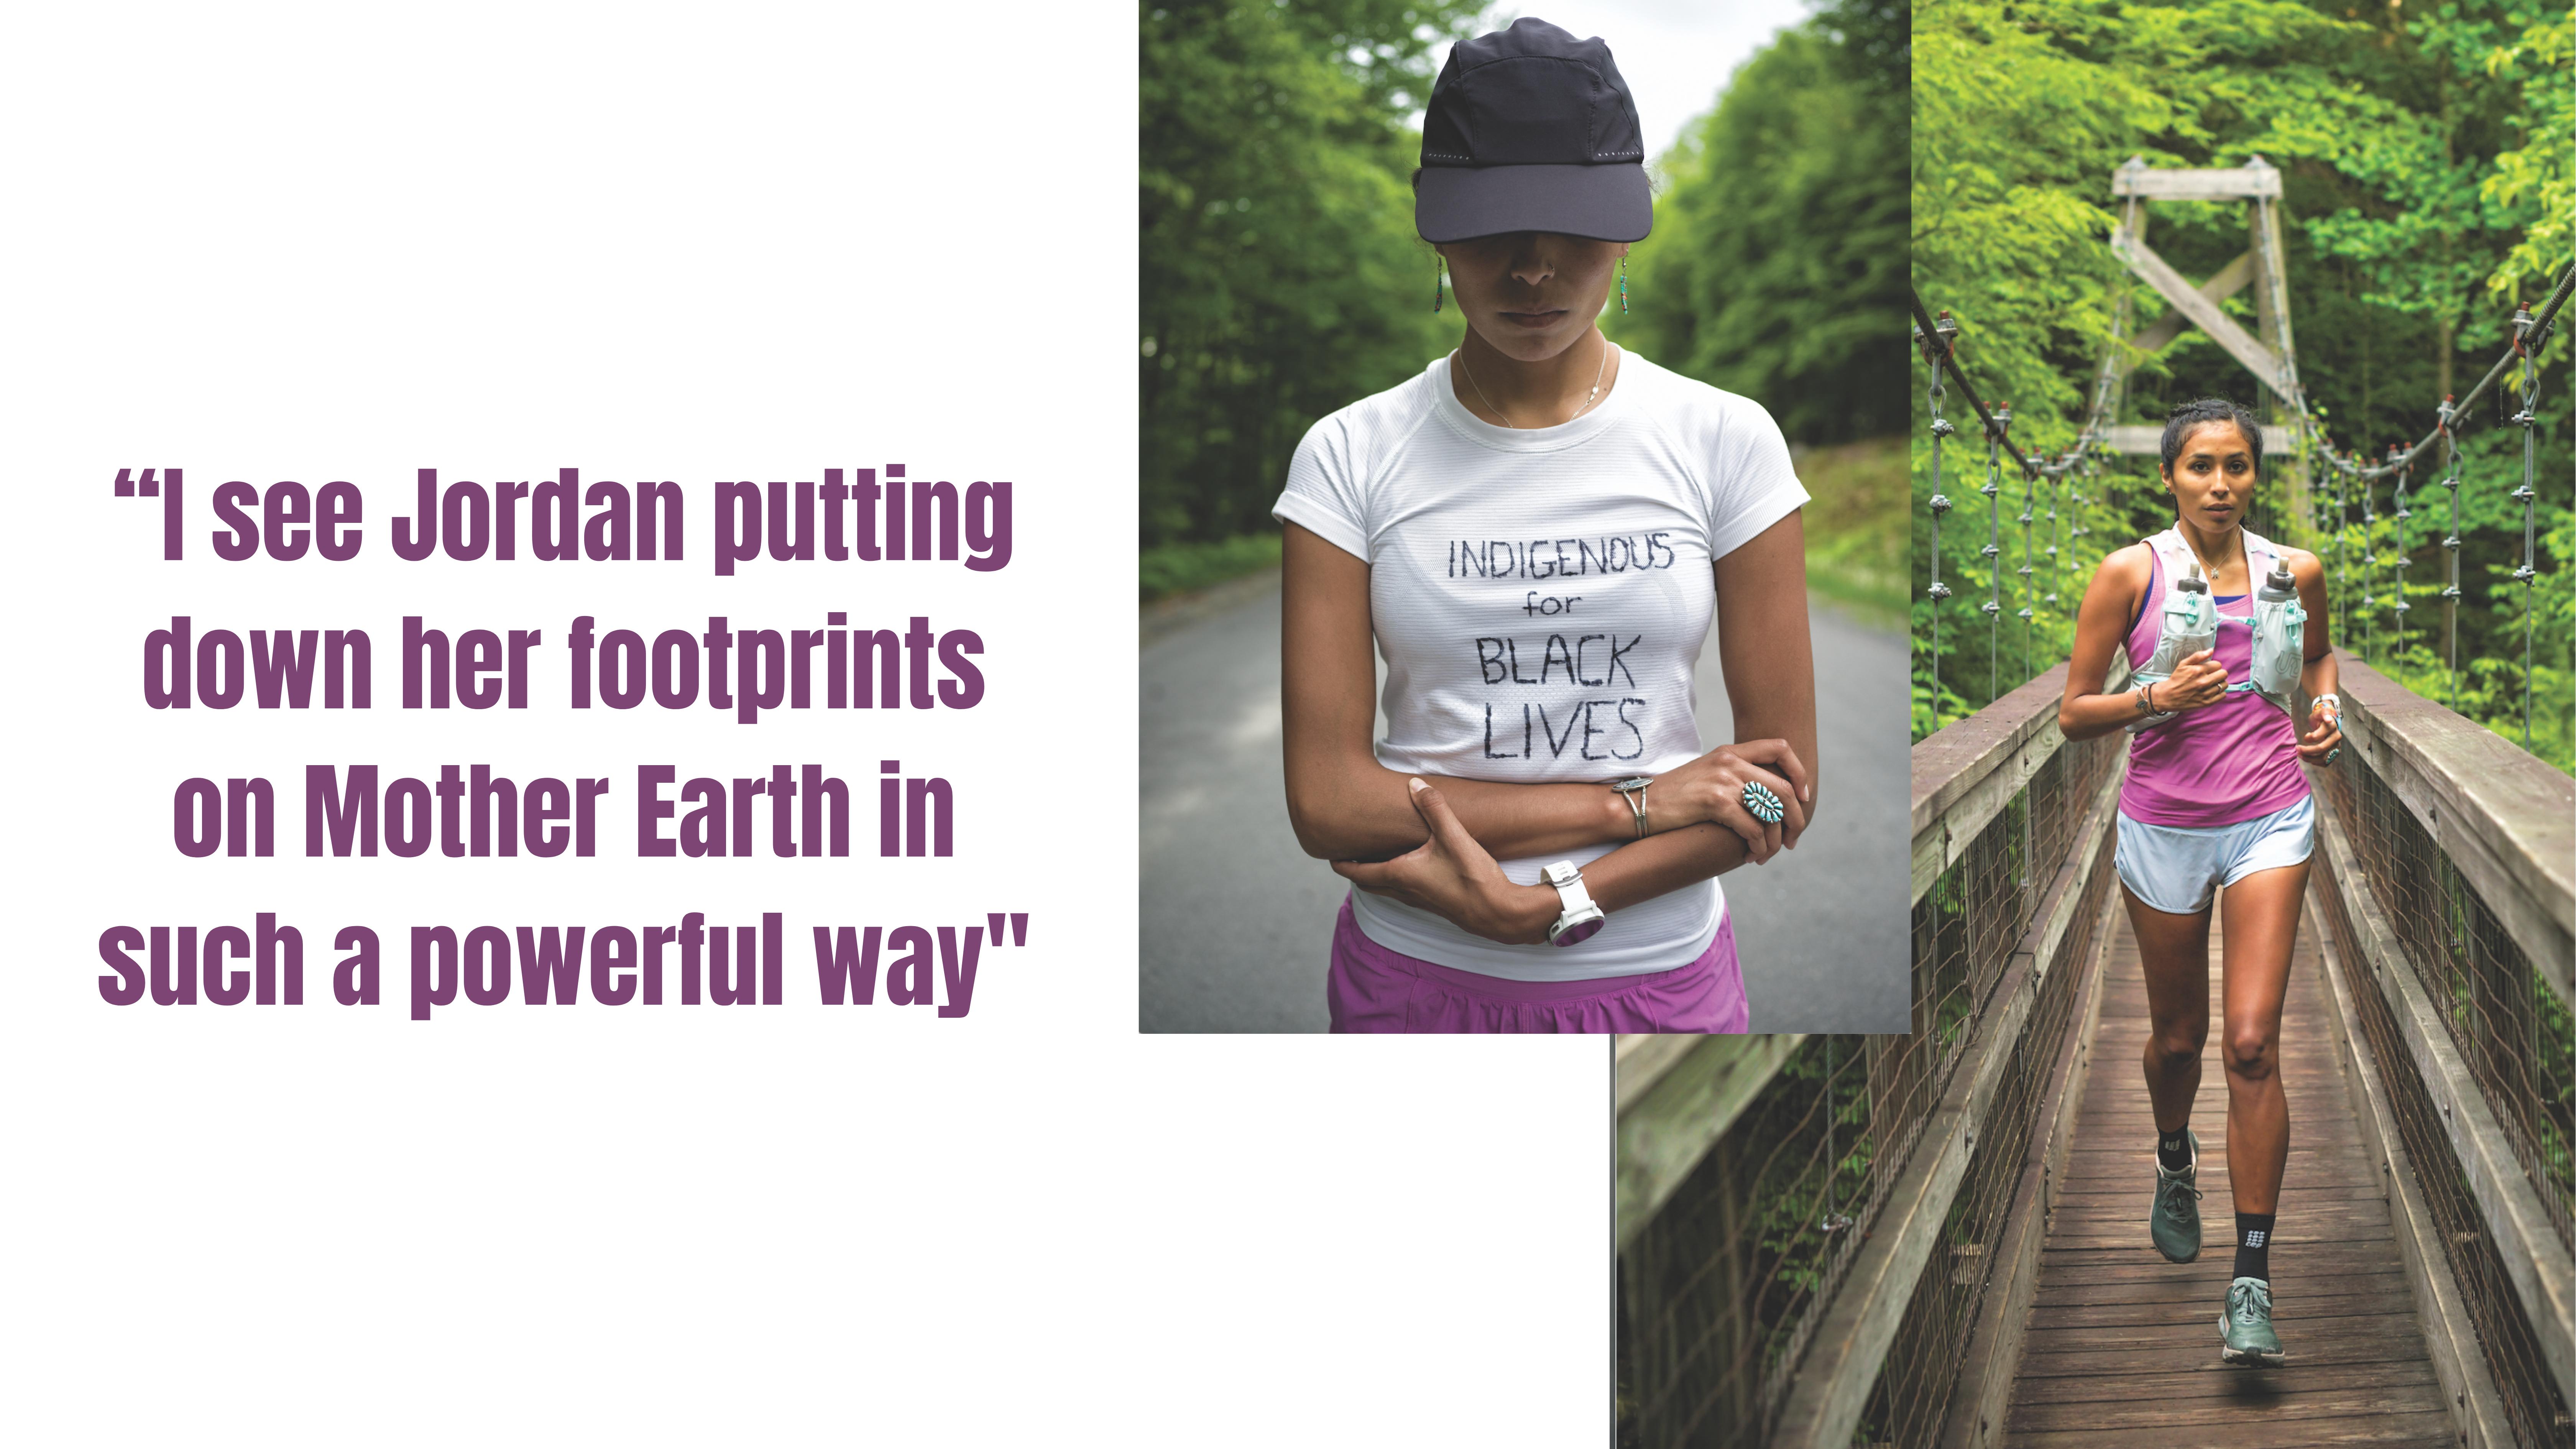 3 Running For Justice | Trail Runner Magazine